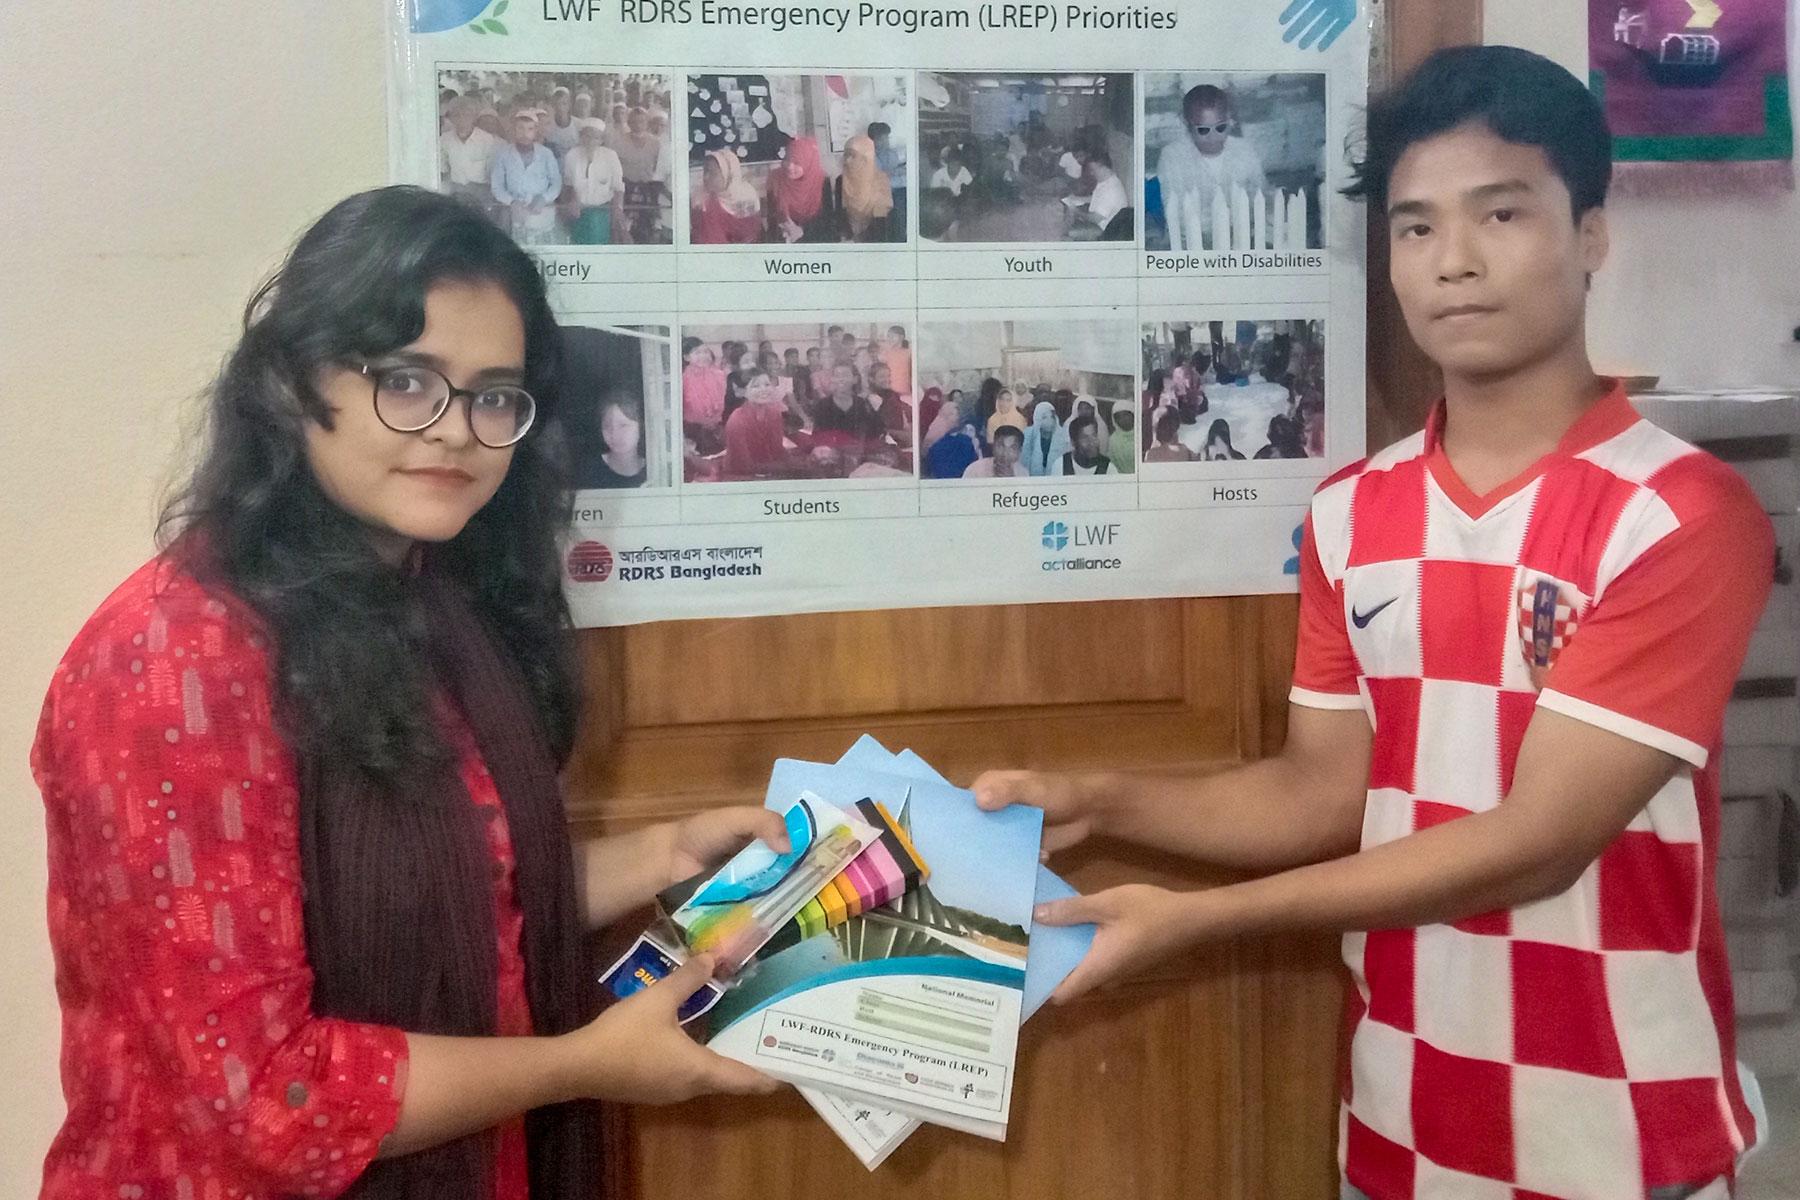 RDRS Bangladesh/B. Wadud